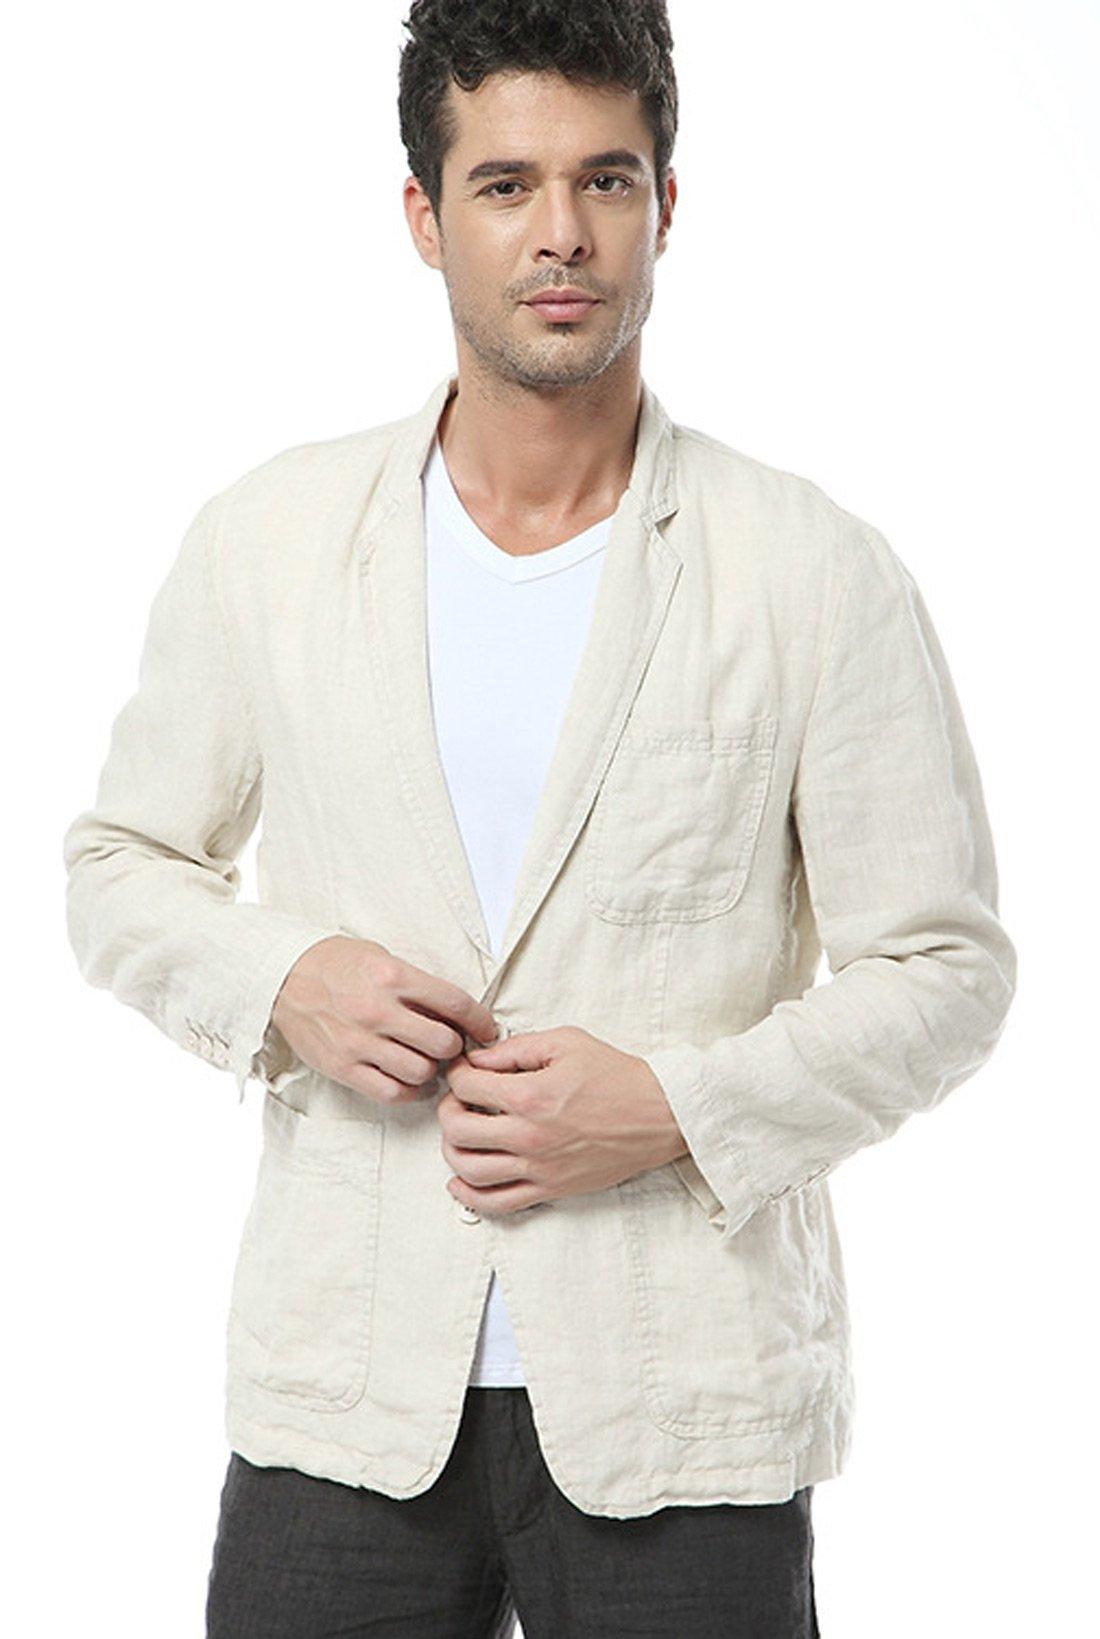 utcoco Men's Casual Lapel Lightweight Two-Button Linen Suit Blazer (Large, Beige) by utcoco